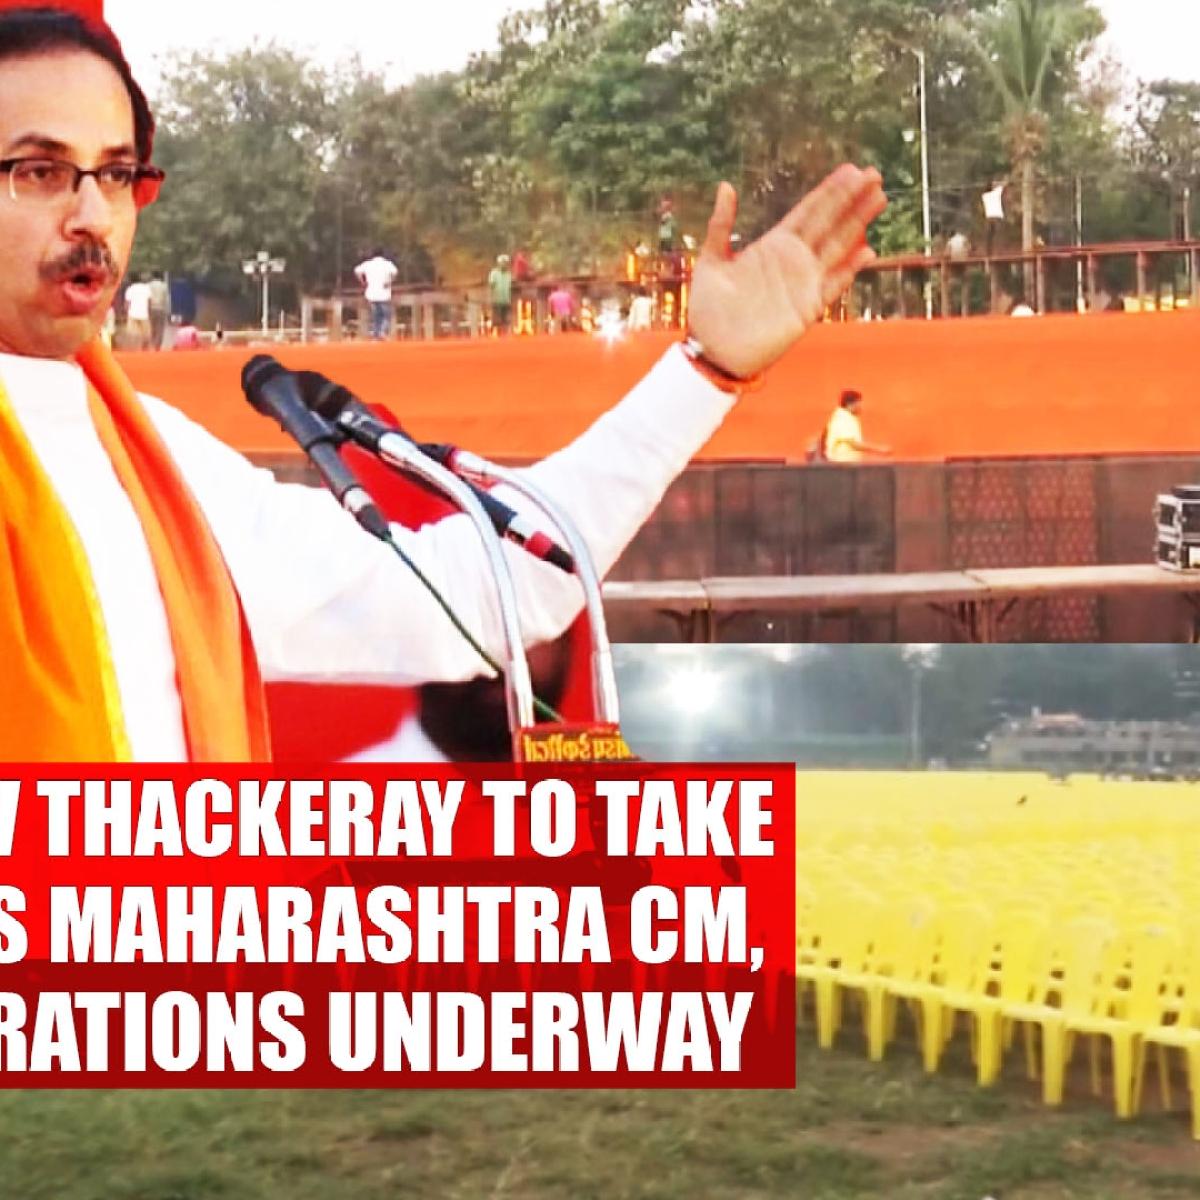 Uddhav Thackeray to take oath as Maha CM, preparations underway